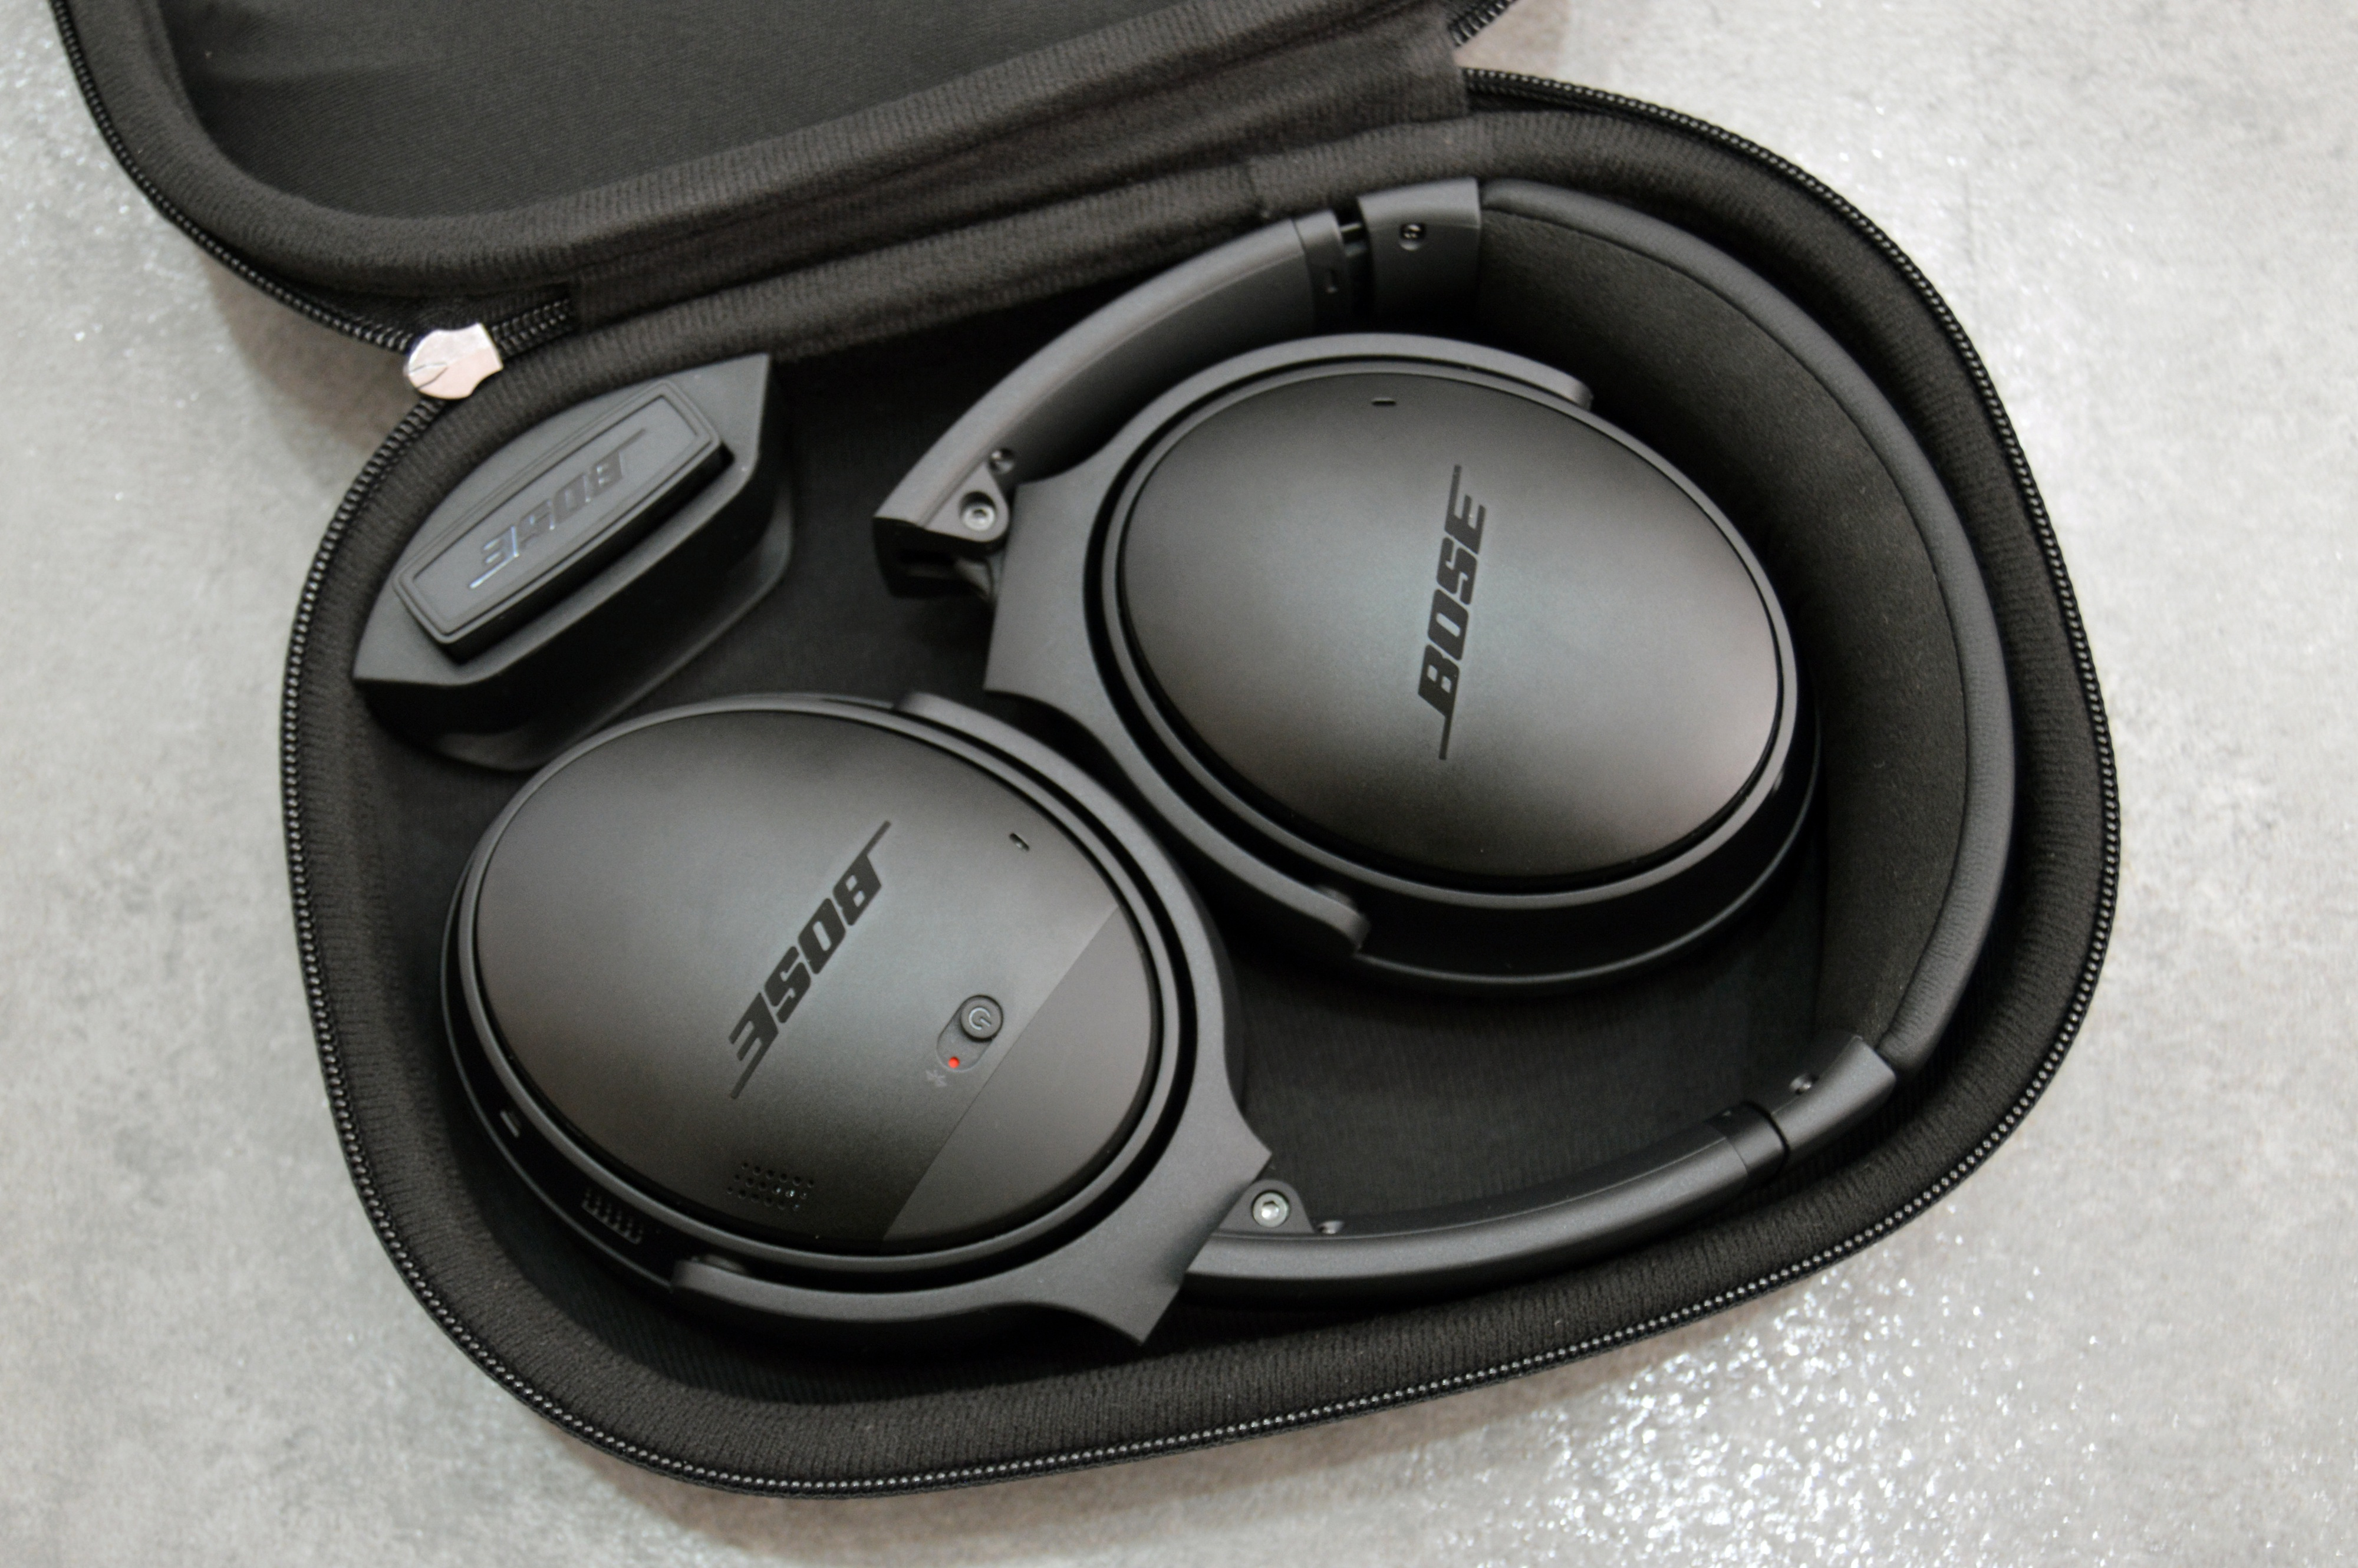 Bose wireless headphones qc - bose wireless headphones airplane adapter